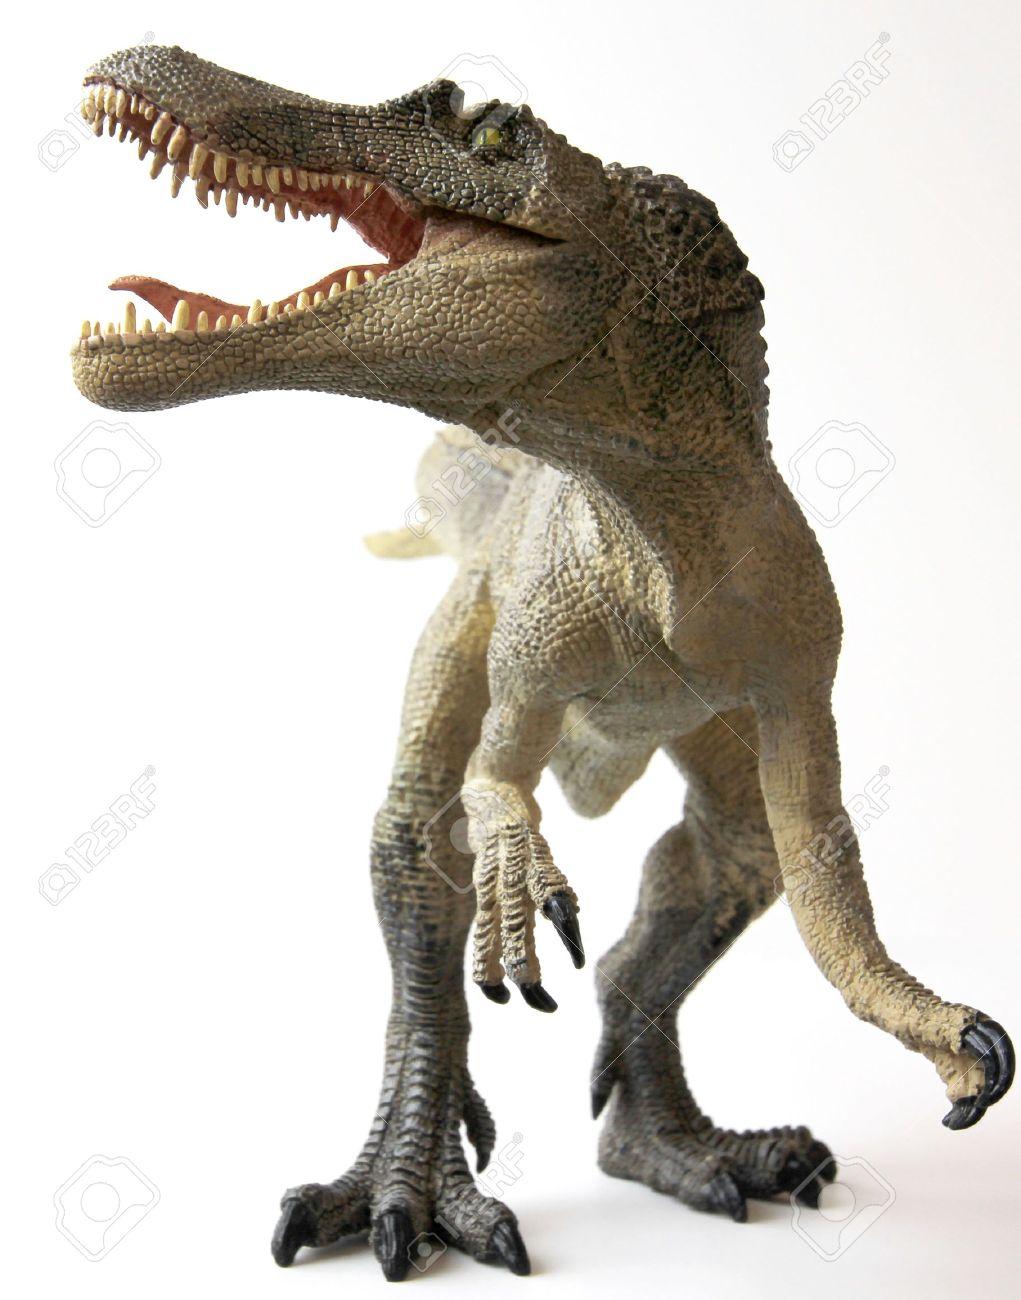 A Spinosaurus Dinosaur with Gaping Jaws Full of Sharp Teeth - 9010374